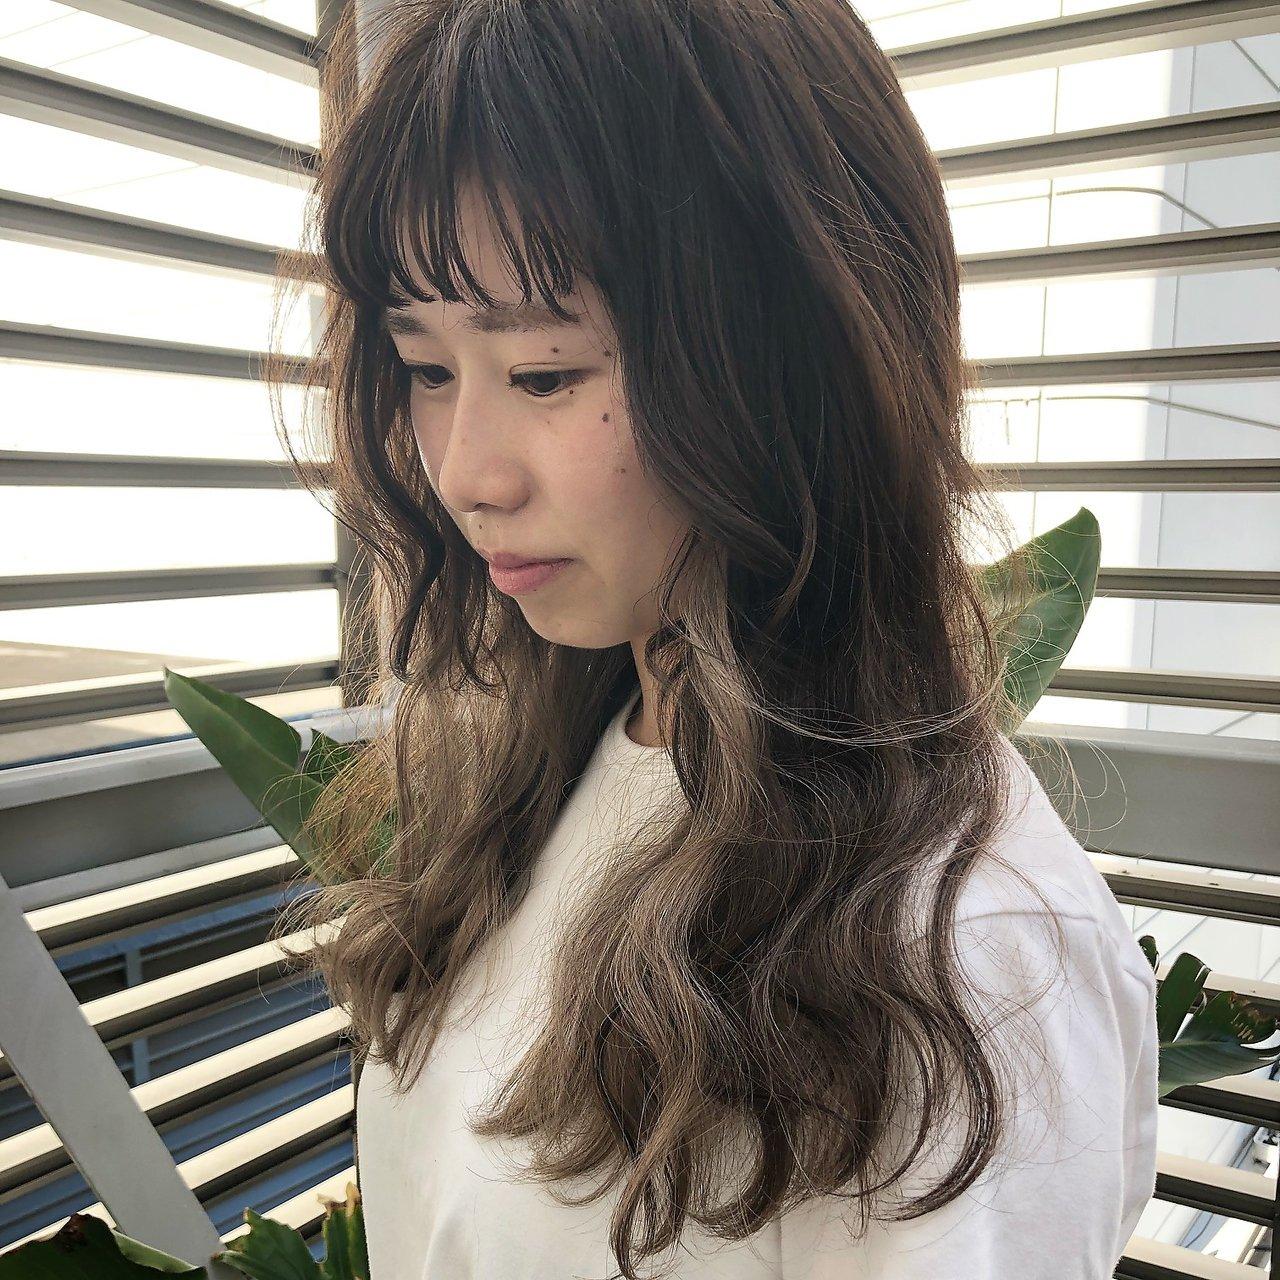 【RITZY】シールエクステ/セミロング